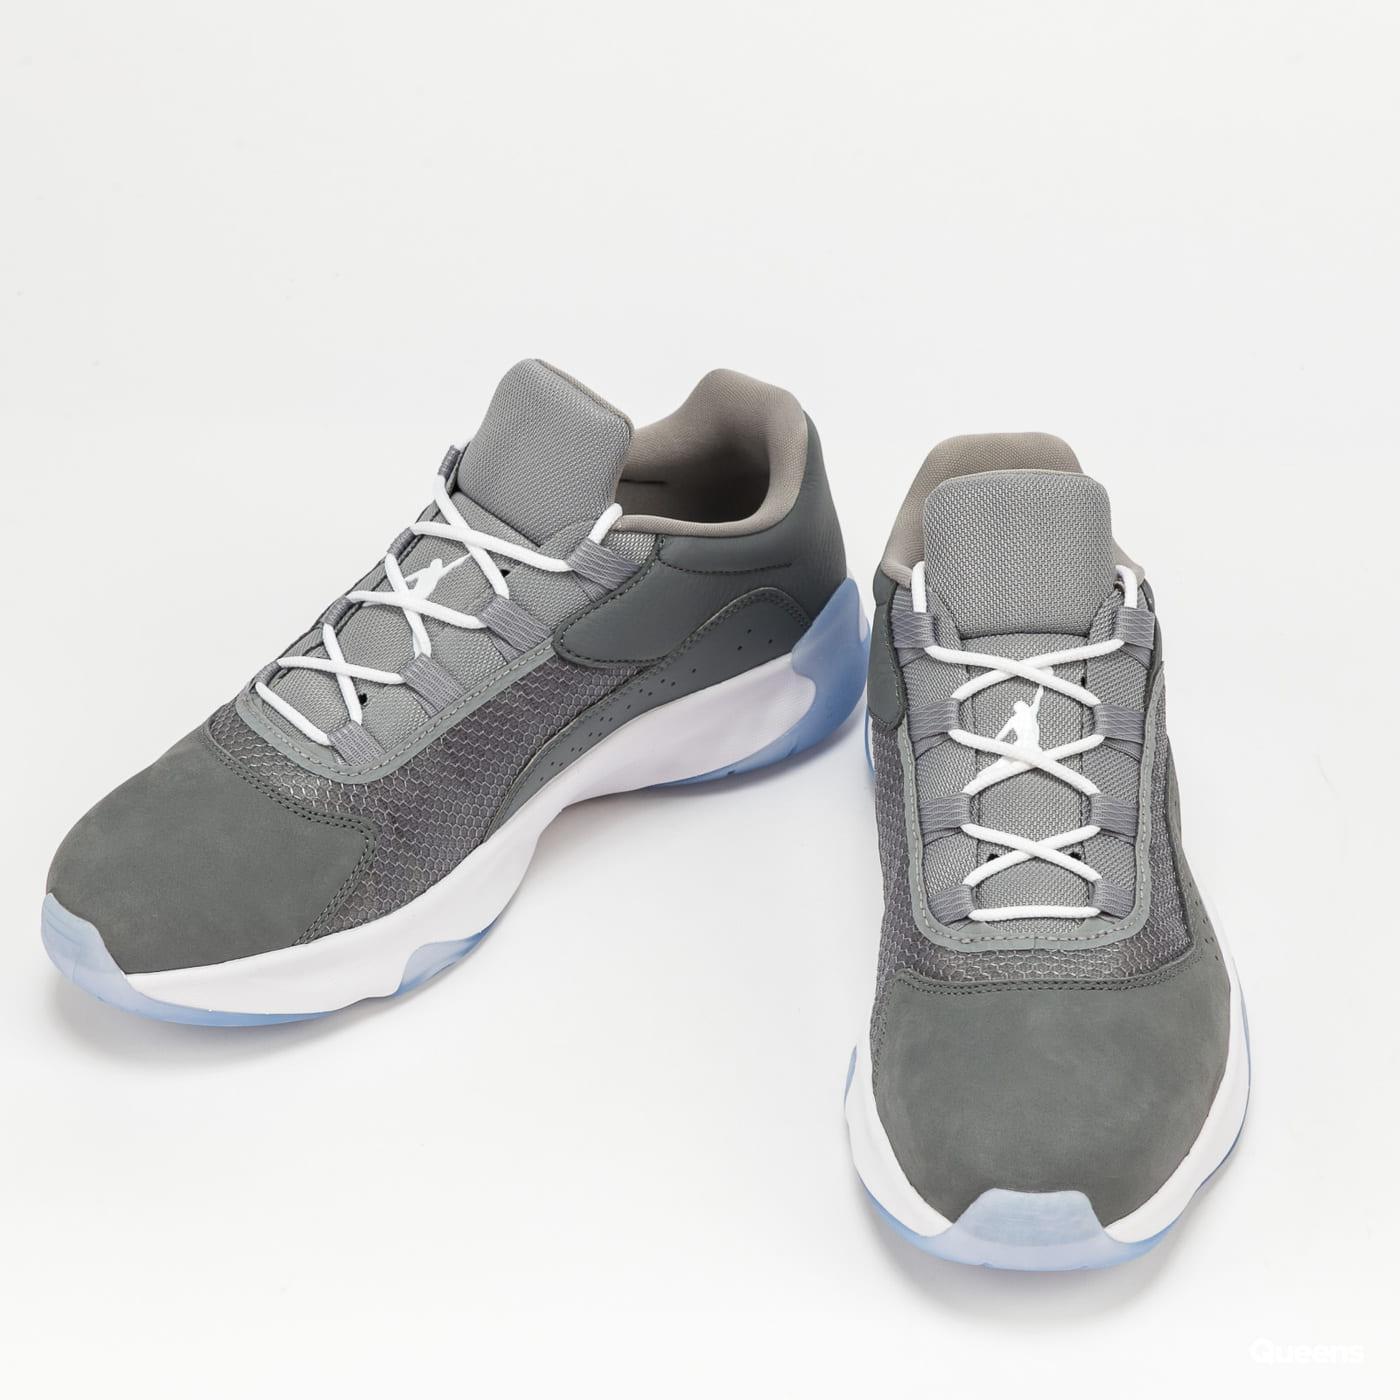 Jordan Air Jordan 11 CMFT Low cool grey / white - medium grey